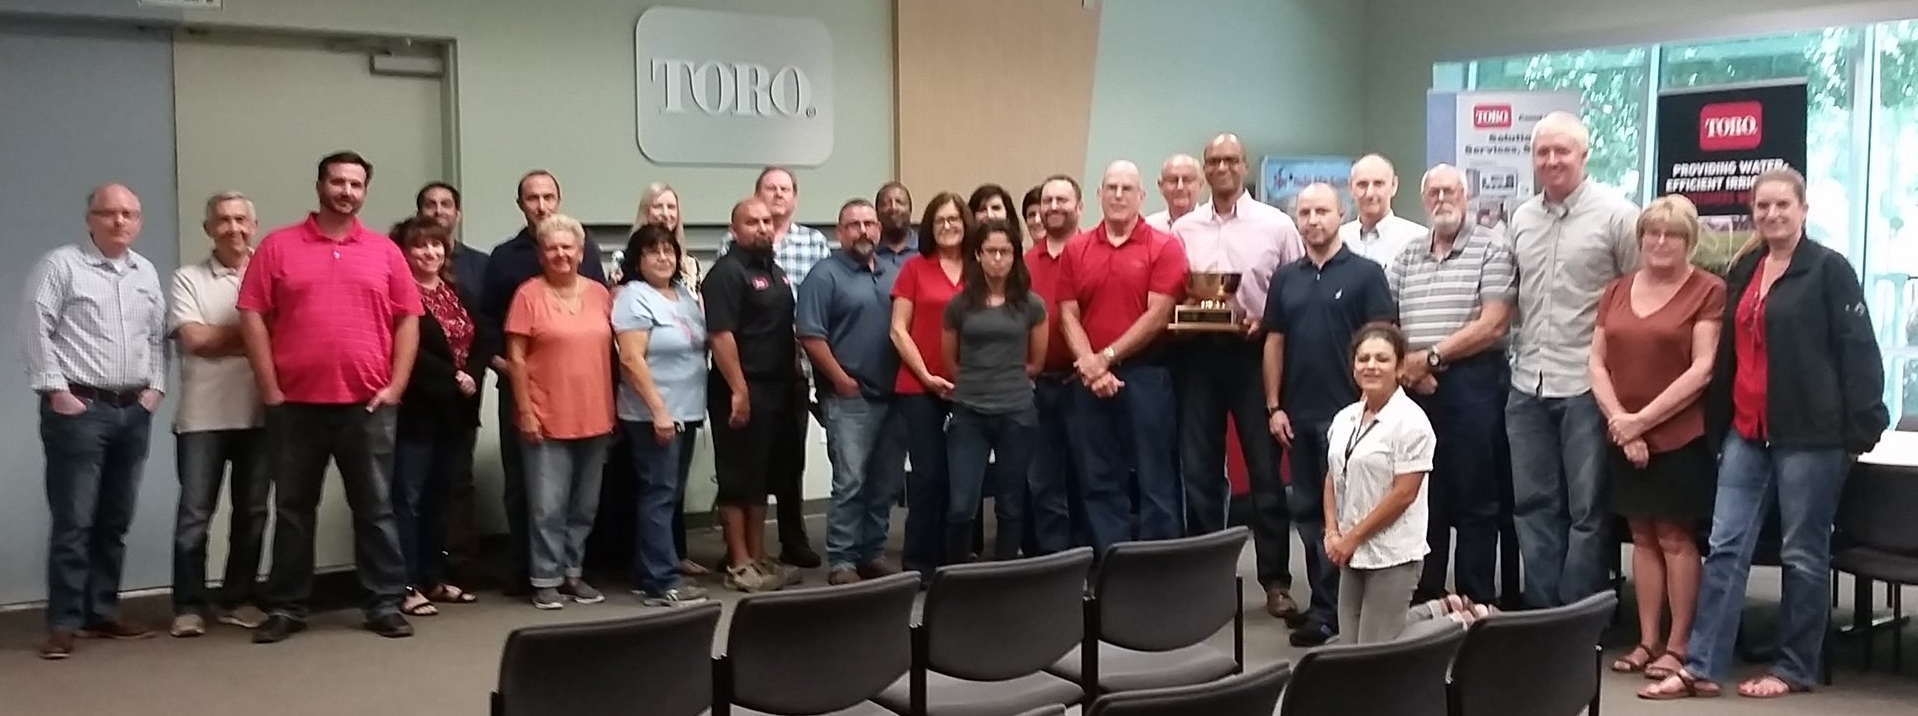 The Toro Company employees